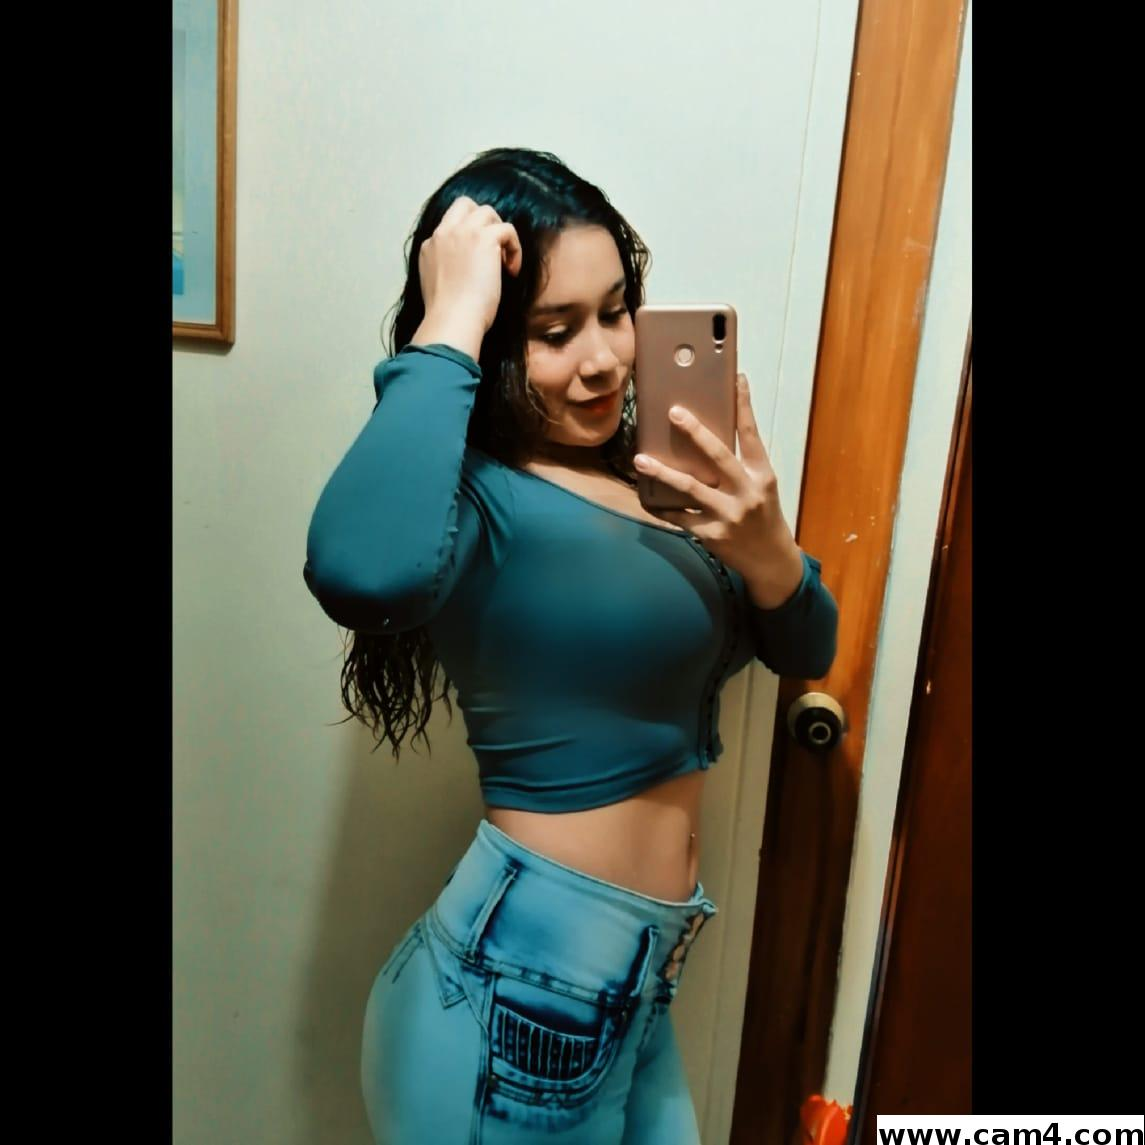 Samantha3 ?s=gsrdr1fxvvqk67qwgcw+dm7evsiyzlnygeo7obp3eeg=